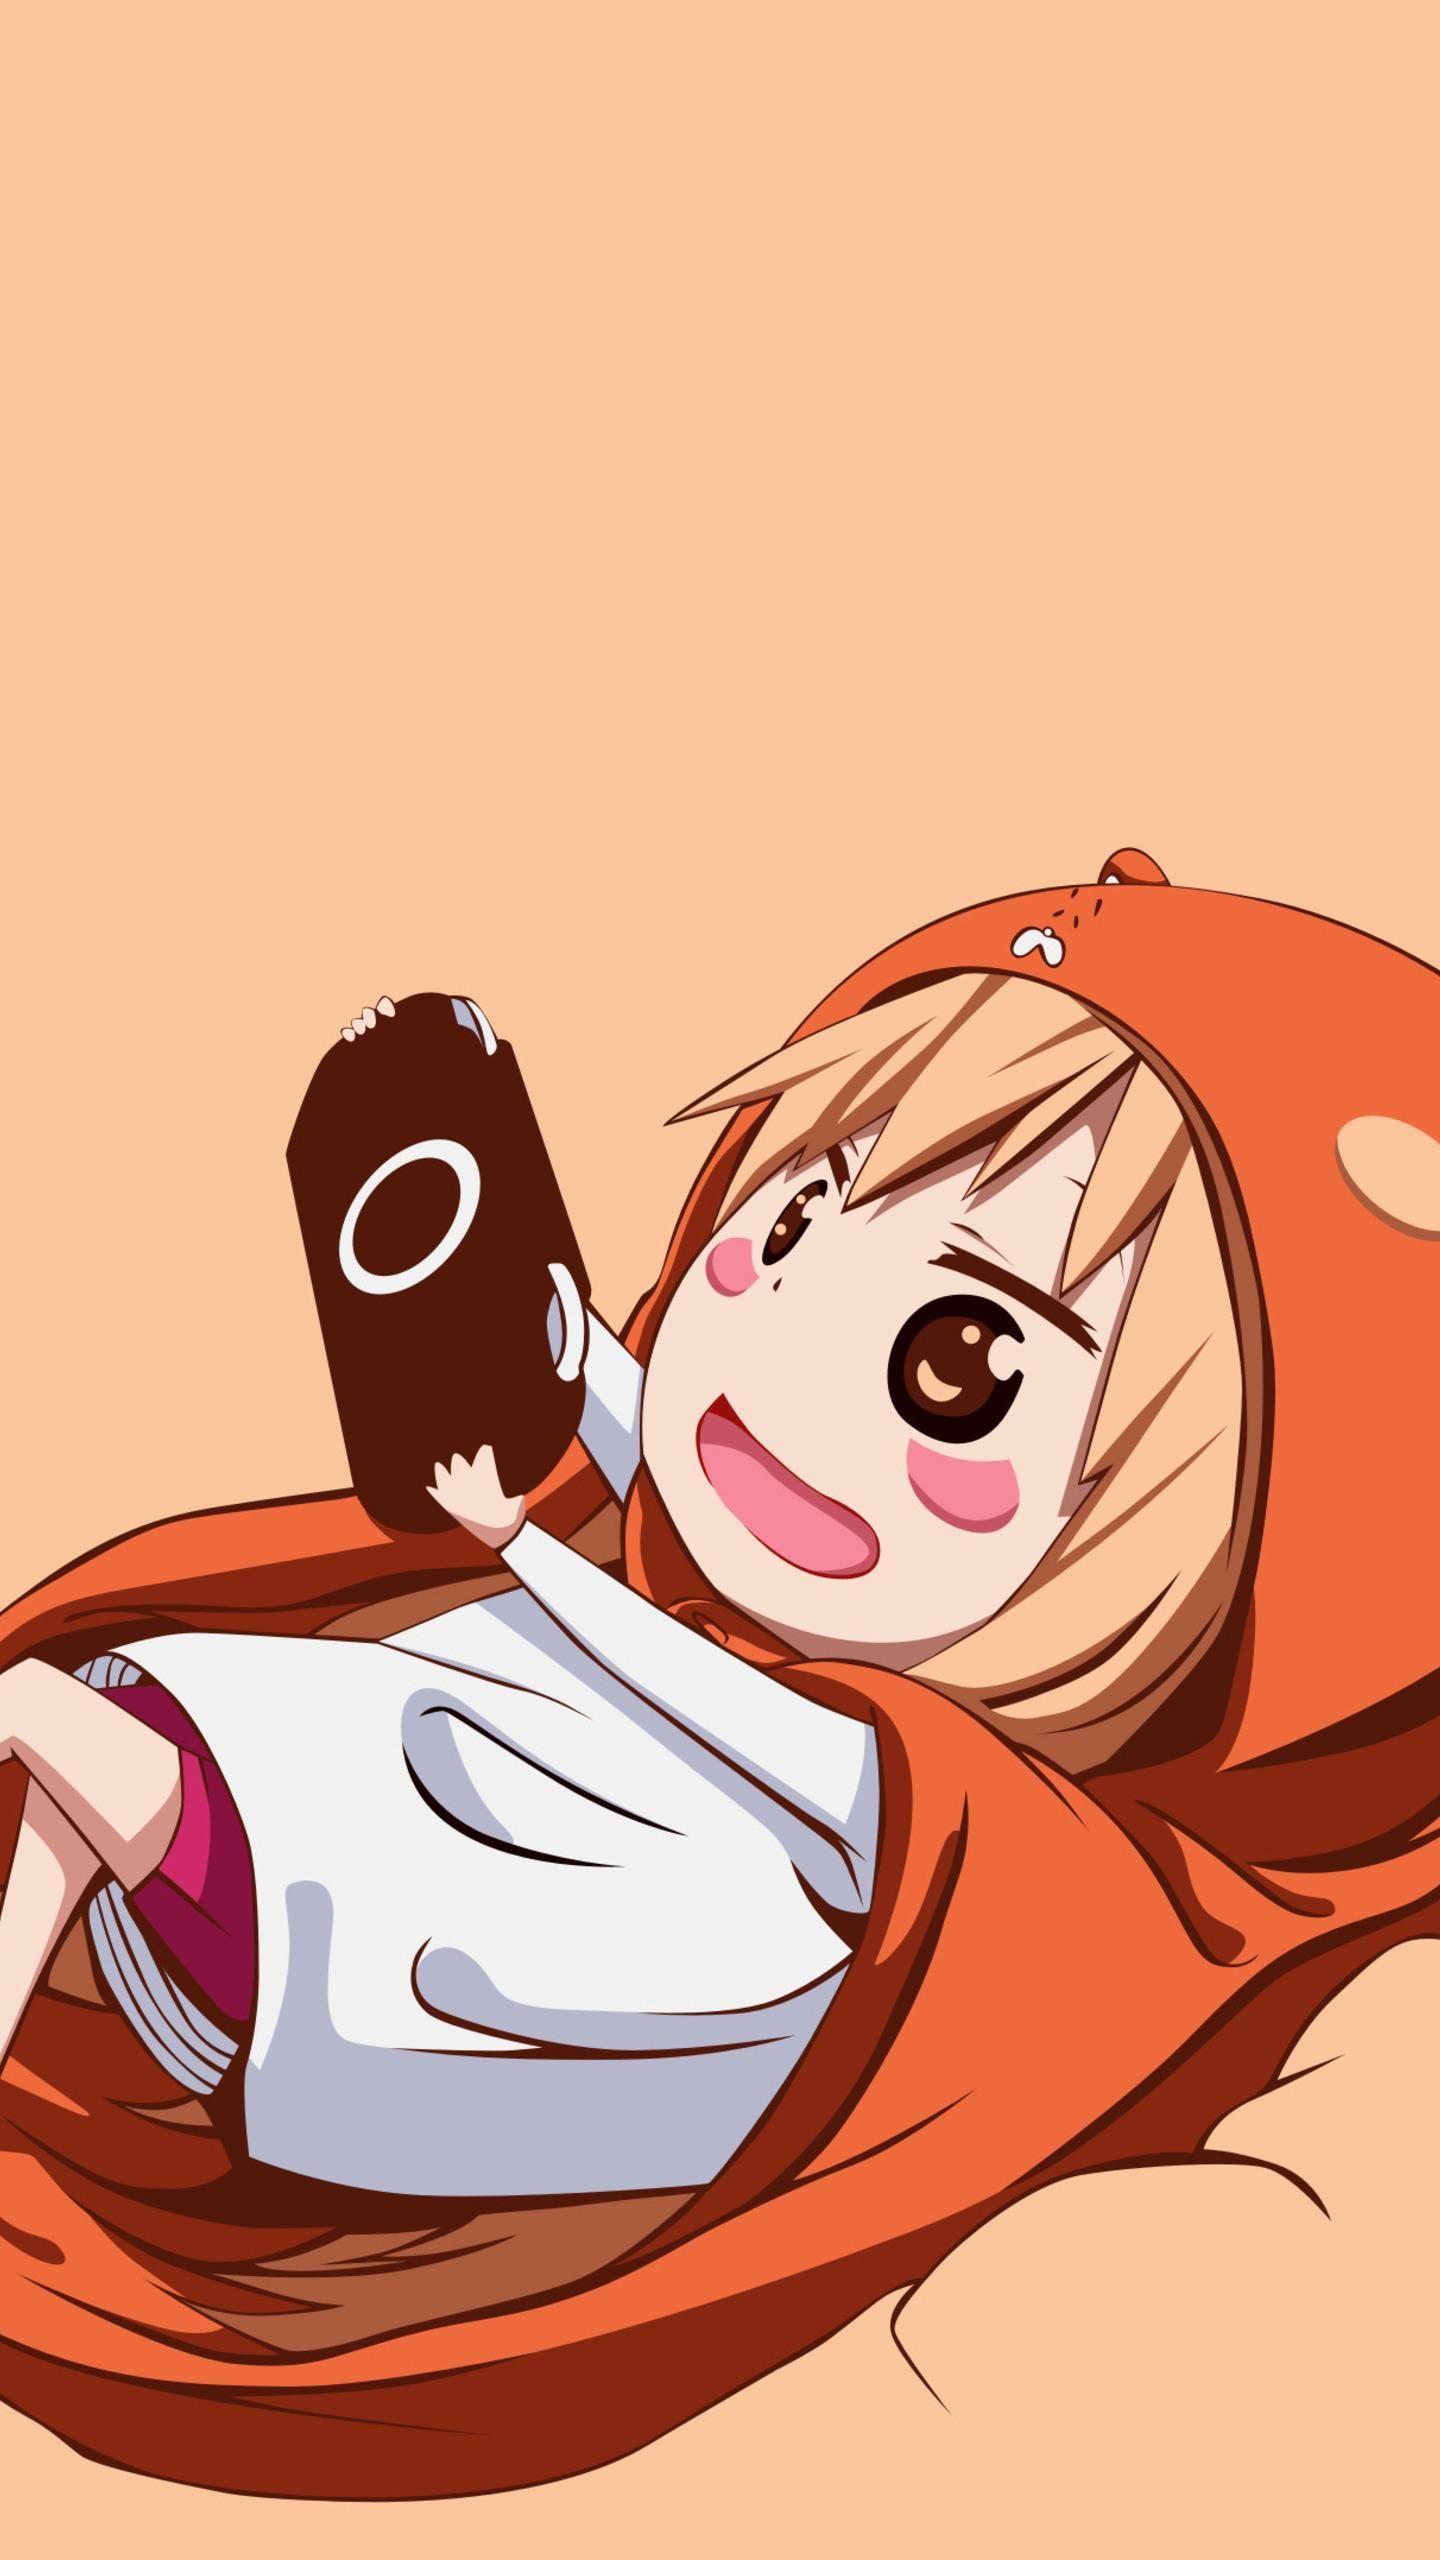 35 Gambar Wallpaper Hd Anime Lucu Terbaru 2020 Chibi Gambar Kartun